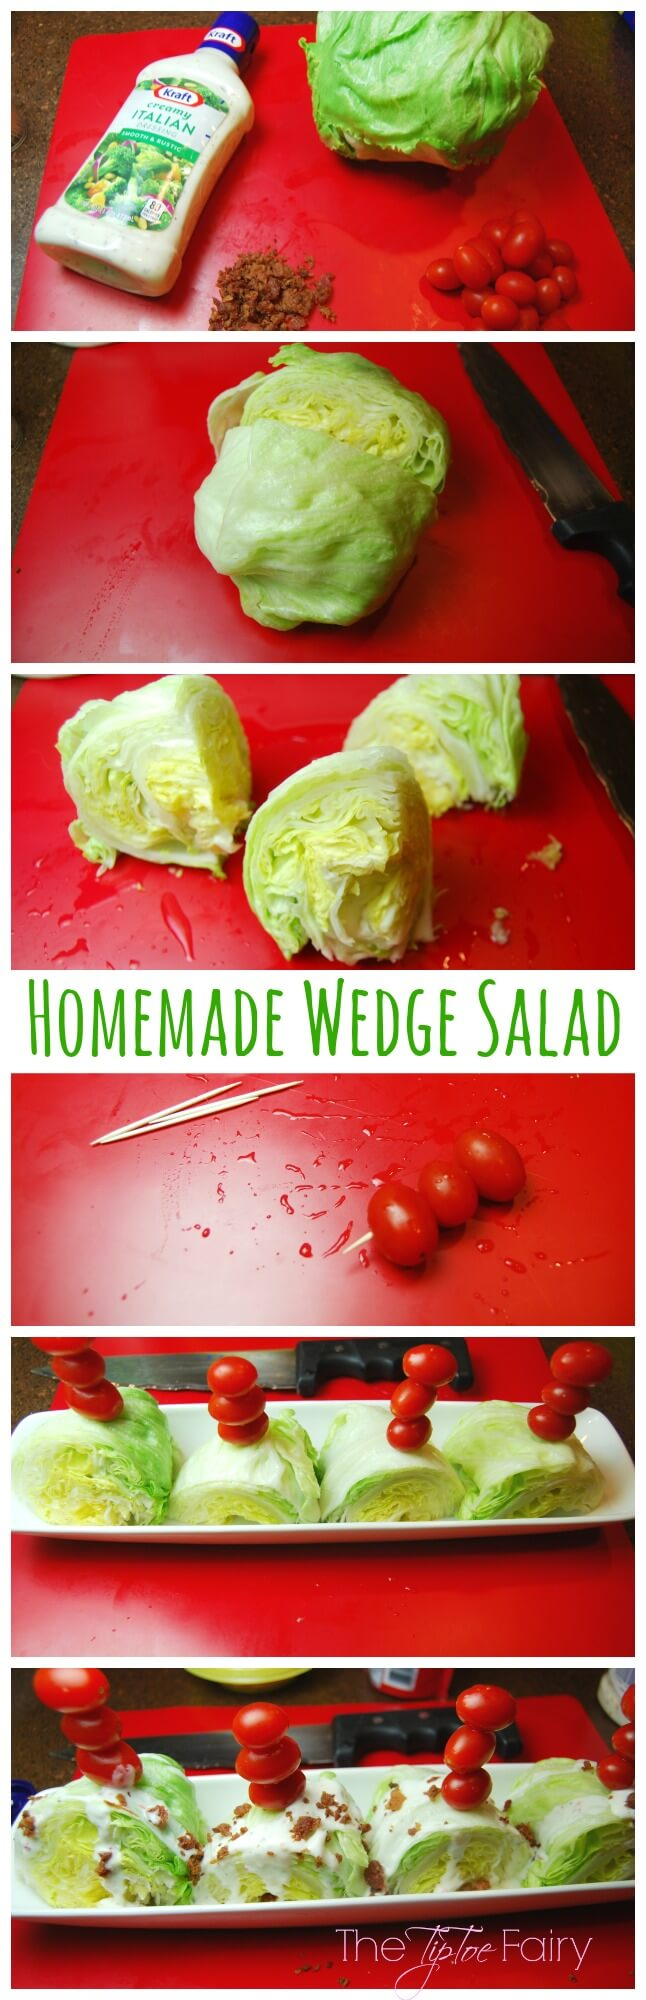 Homemade Wedge Salad | The TipToe Fairy #GameTimeHero #CollectiveBias #ad #saladrecipes #wedgesalad